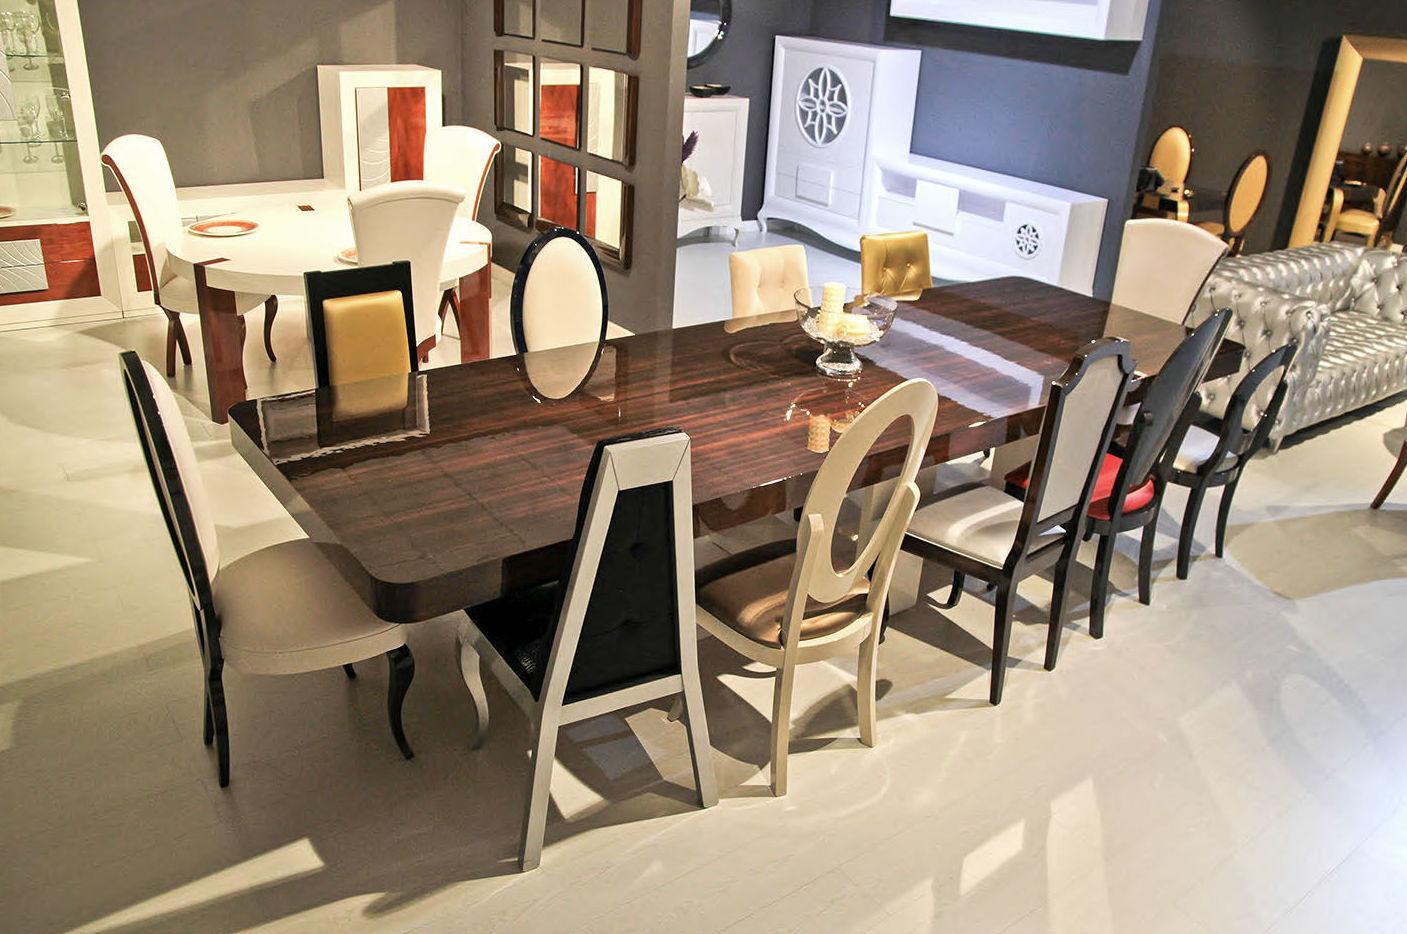 Sillas cat logo de muebles y sof s de goga muebles complementos - Muebles y complementos ...